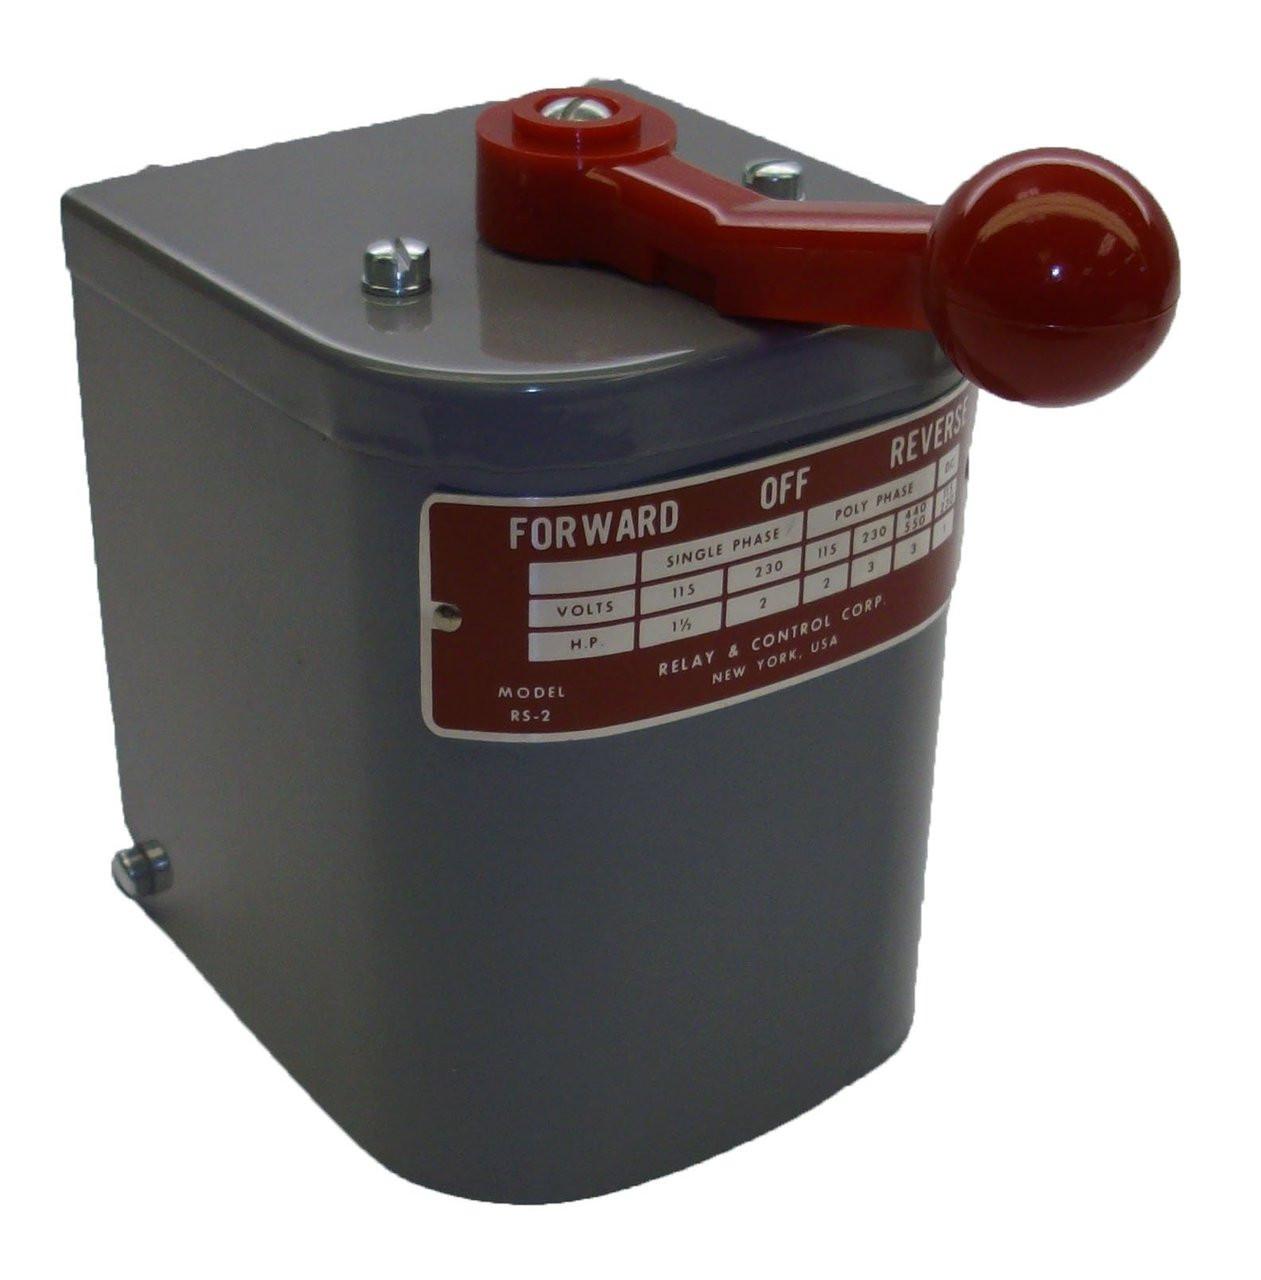 1 5 hp 2 hp electric motor reversing drum switch position rh electricmotorwarehouse com Fan Motor Wiring Diagram Reversible Electric Motor Wiring Diagram